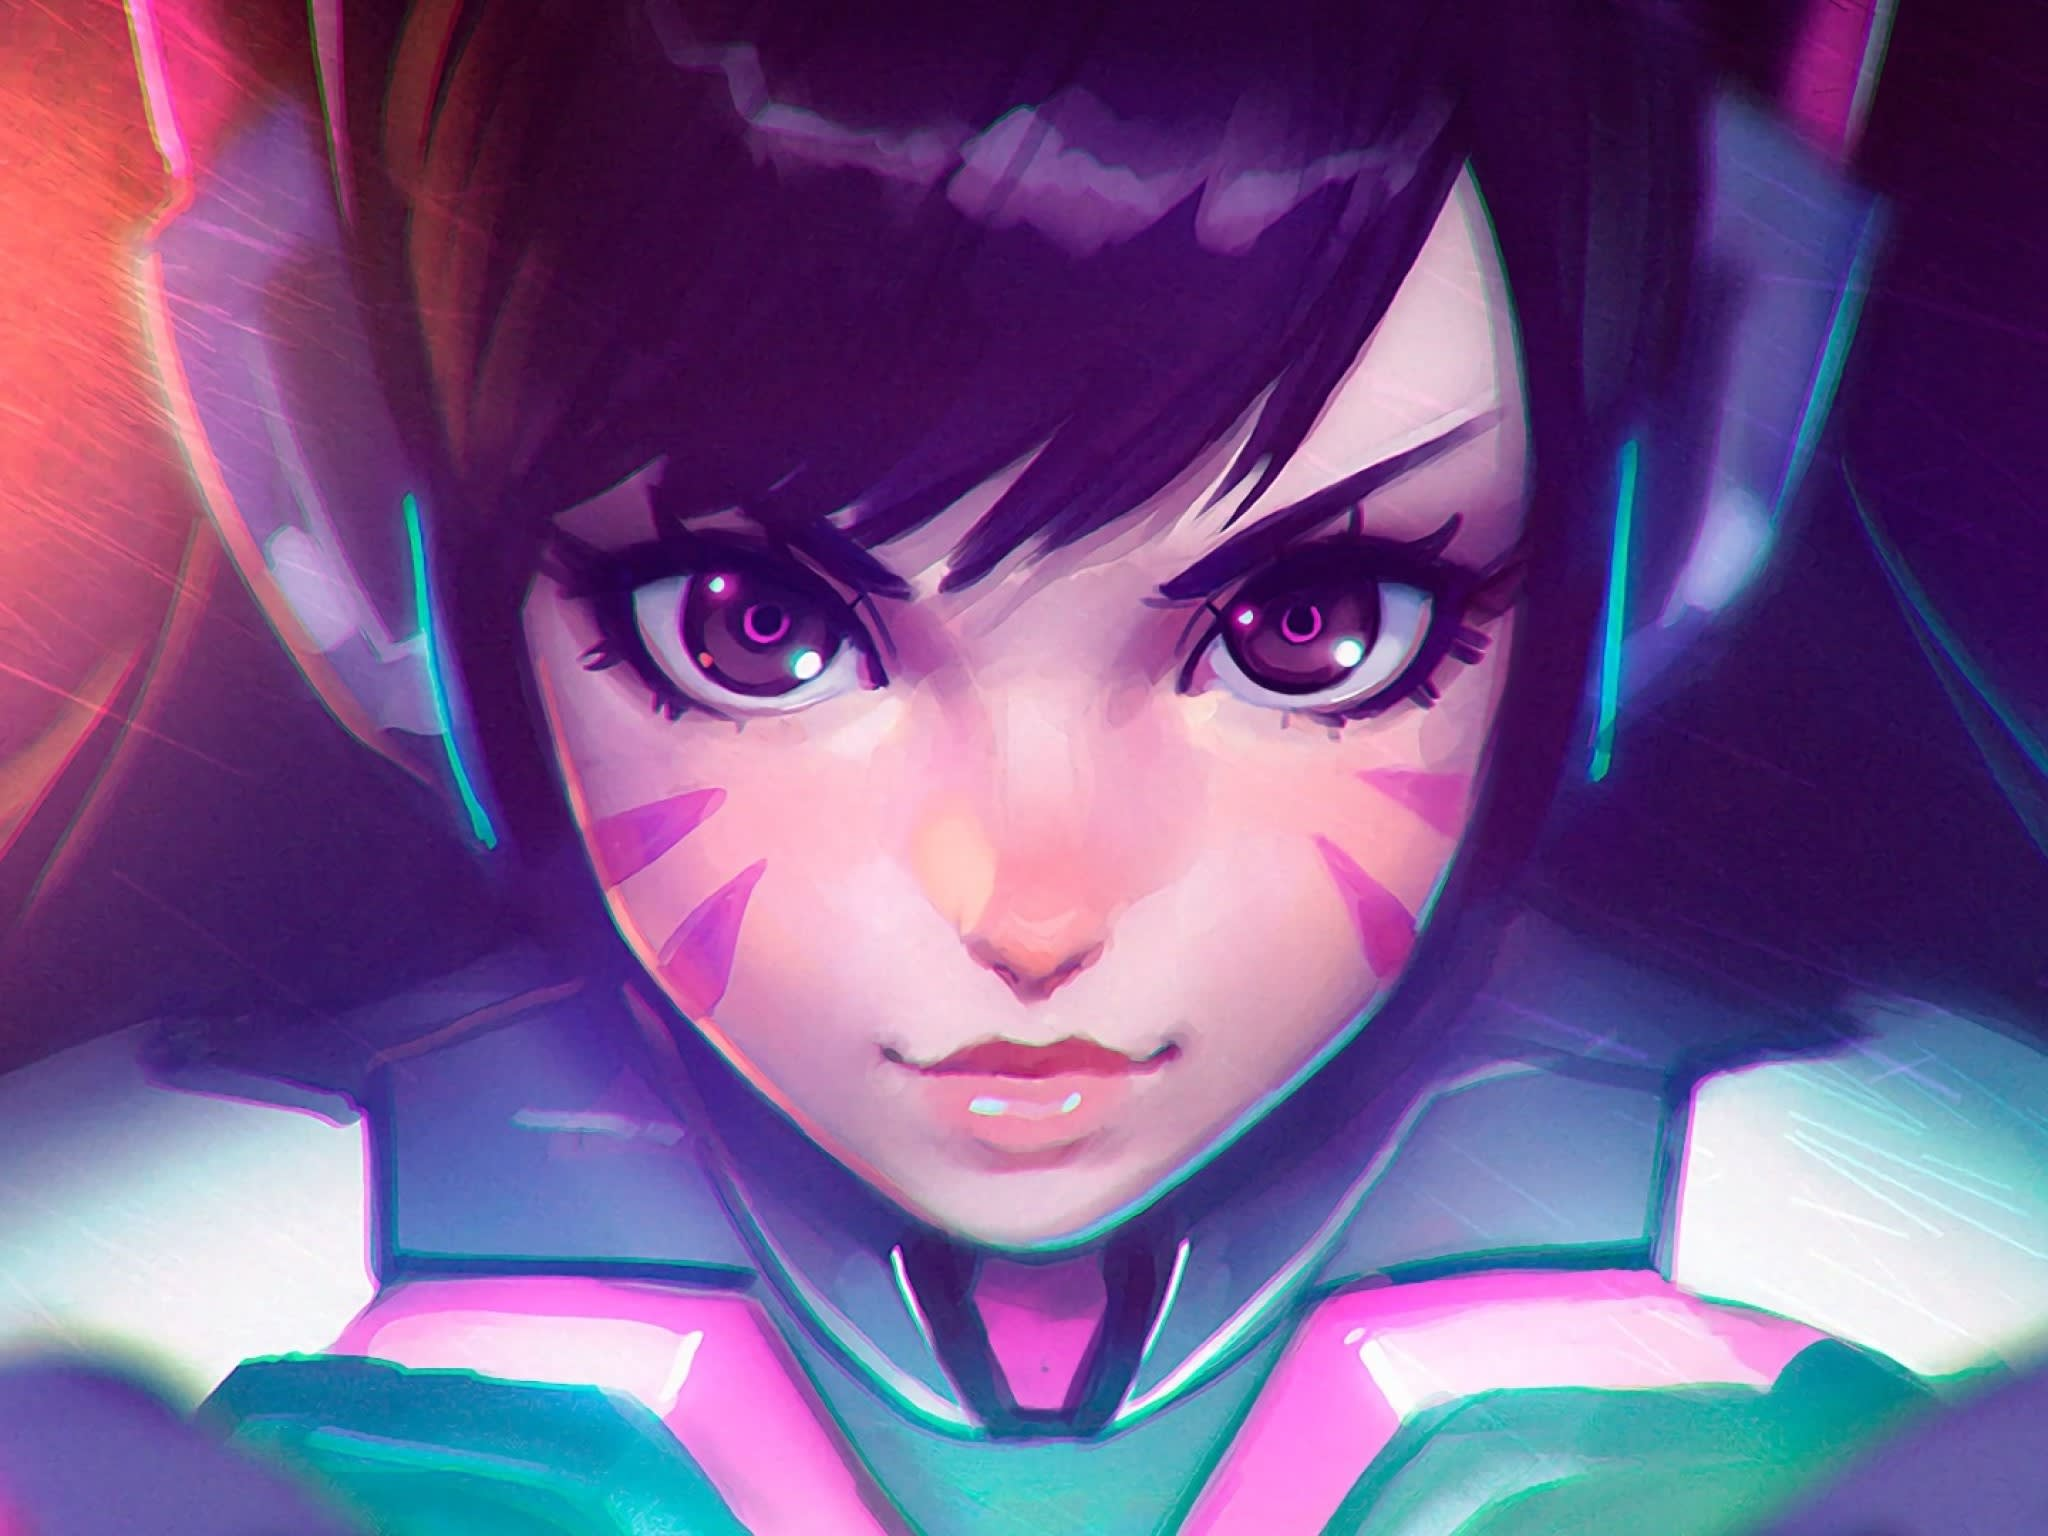 anime gamer girl characters